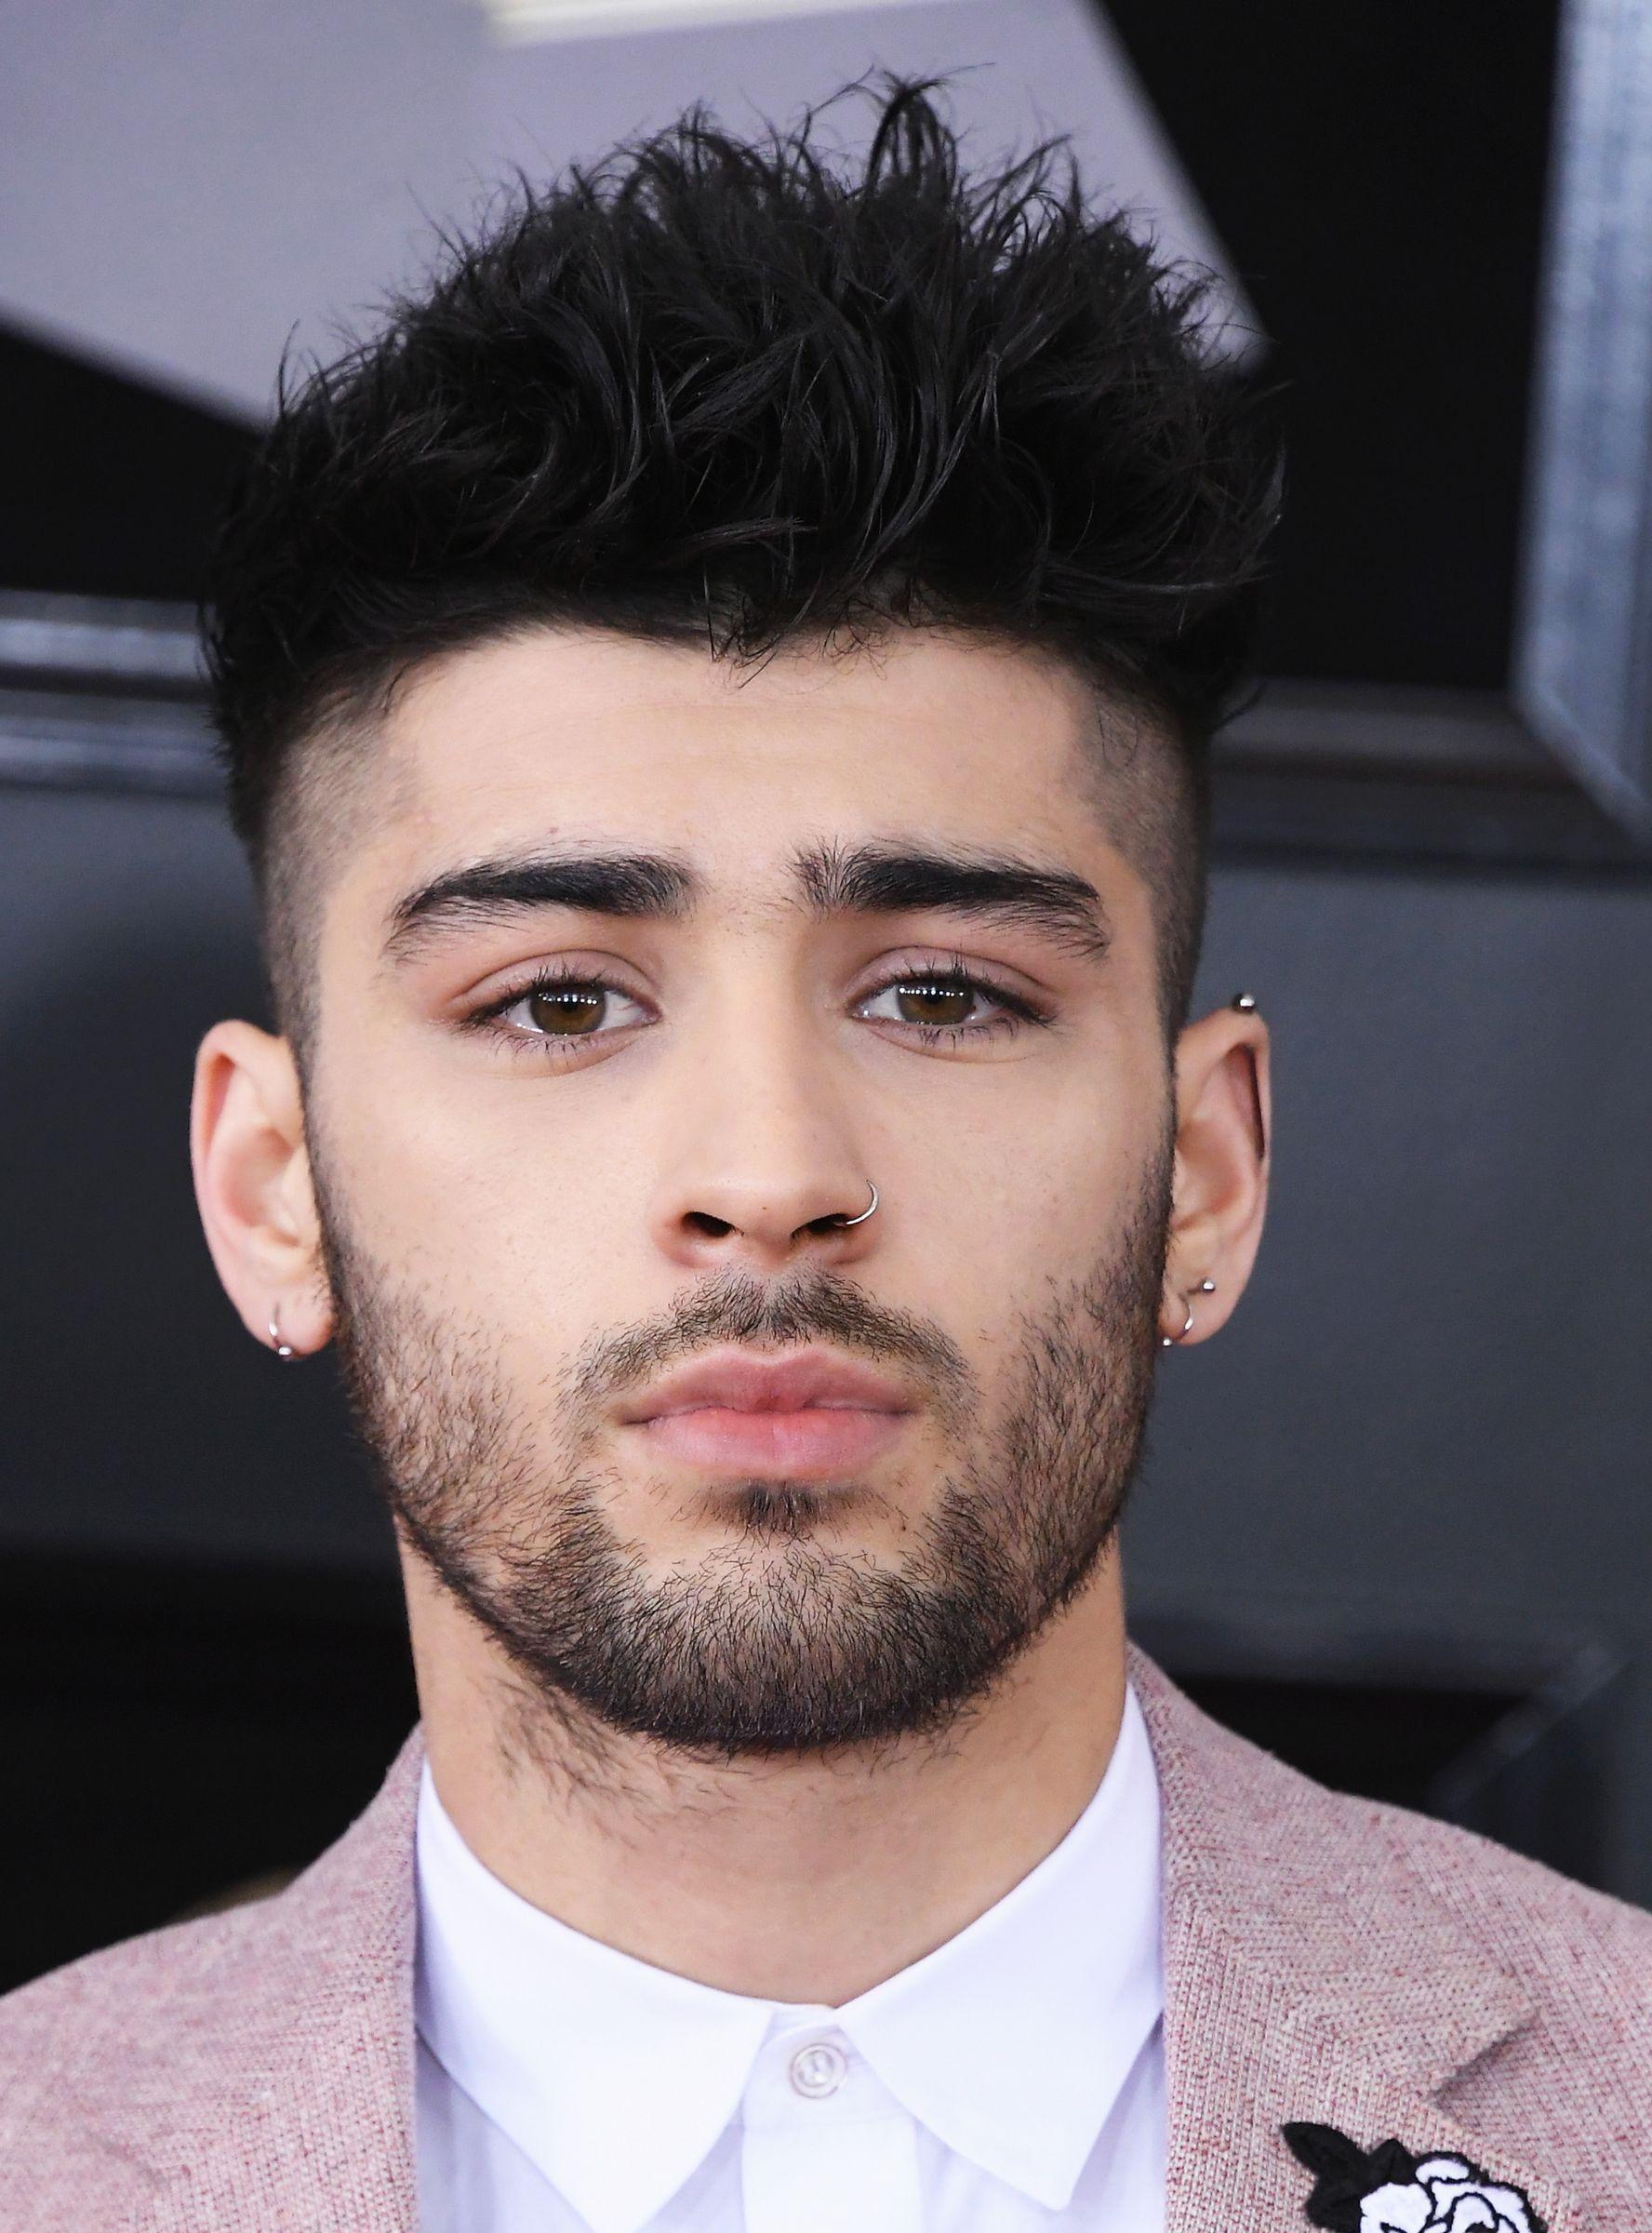 zayn malik bleached his hair & beard blonde — & he's